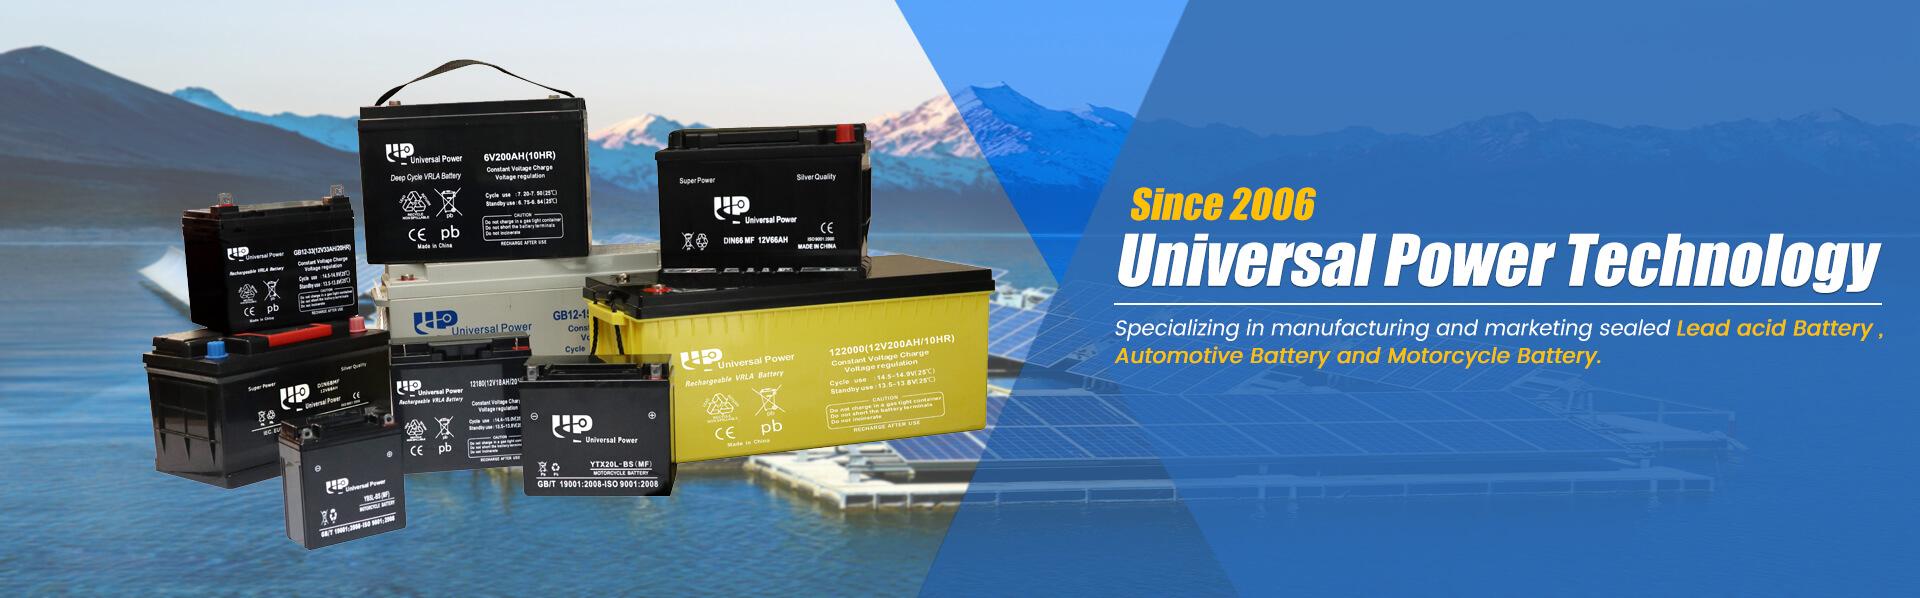 Universal Power Technology Banner 0401